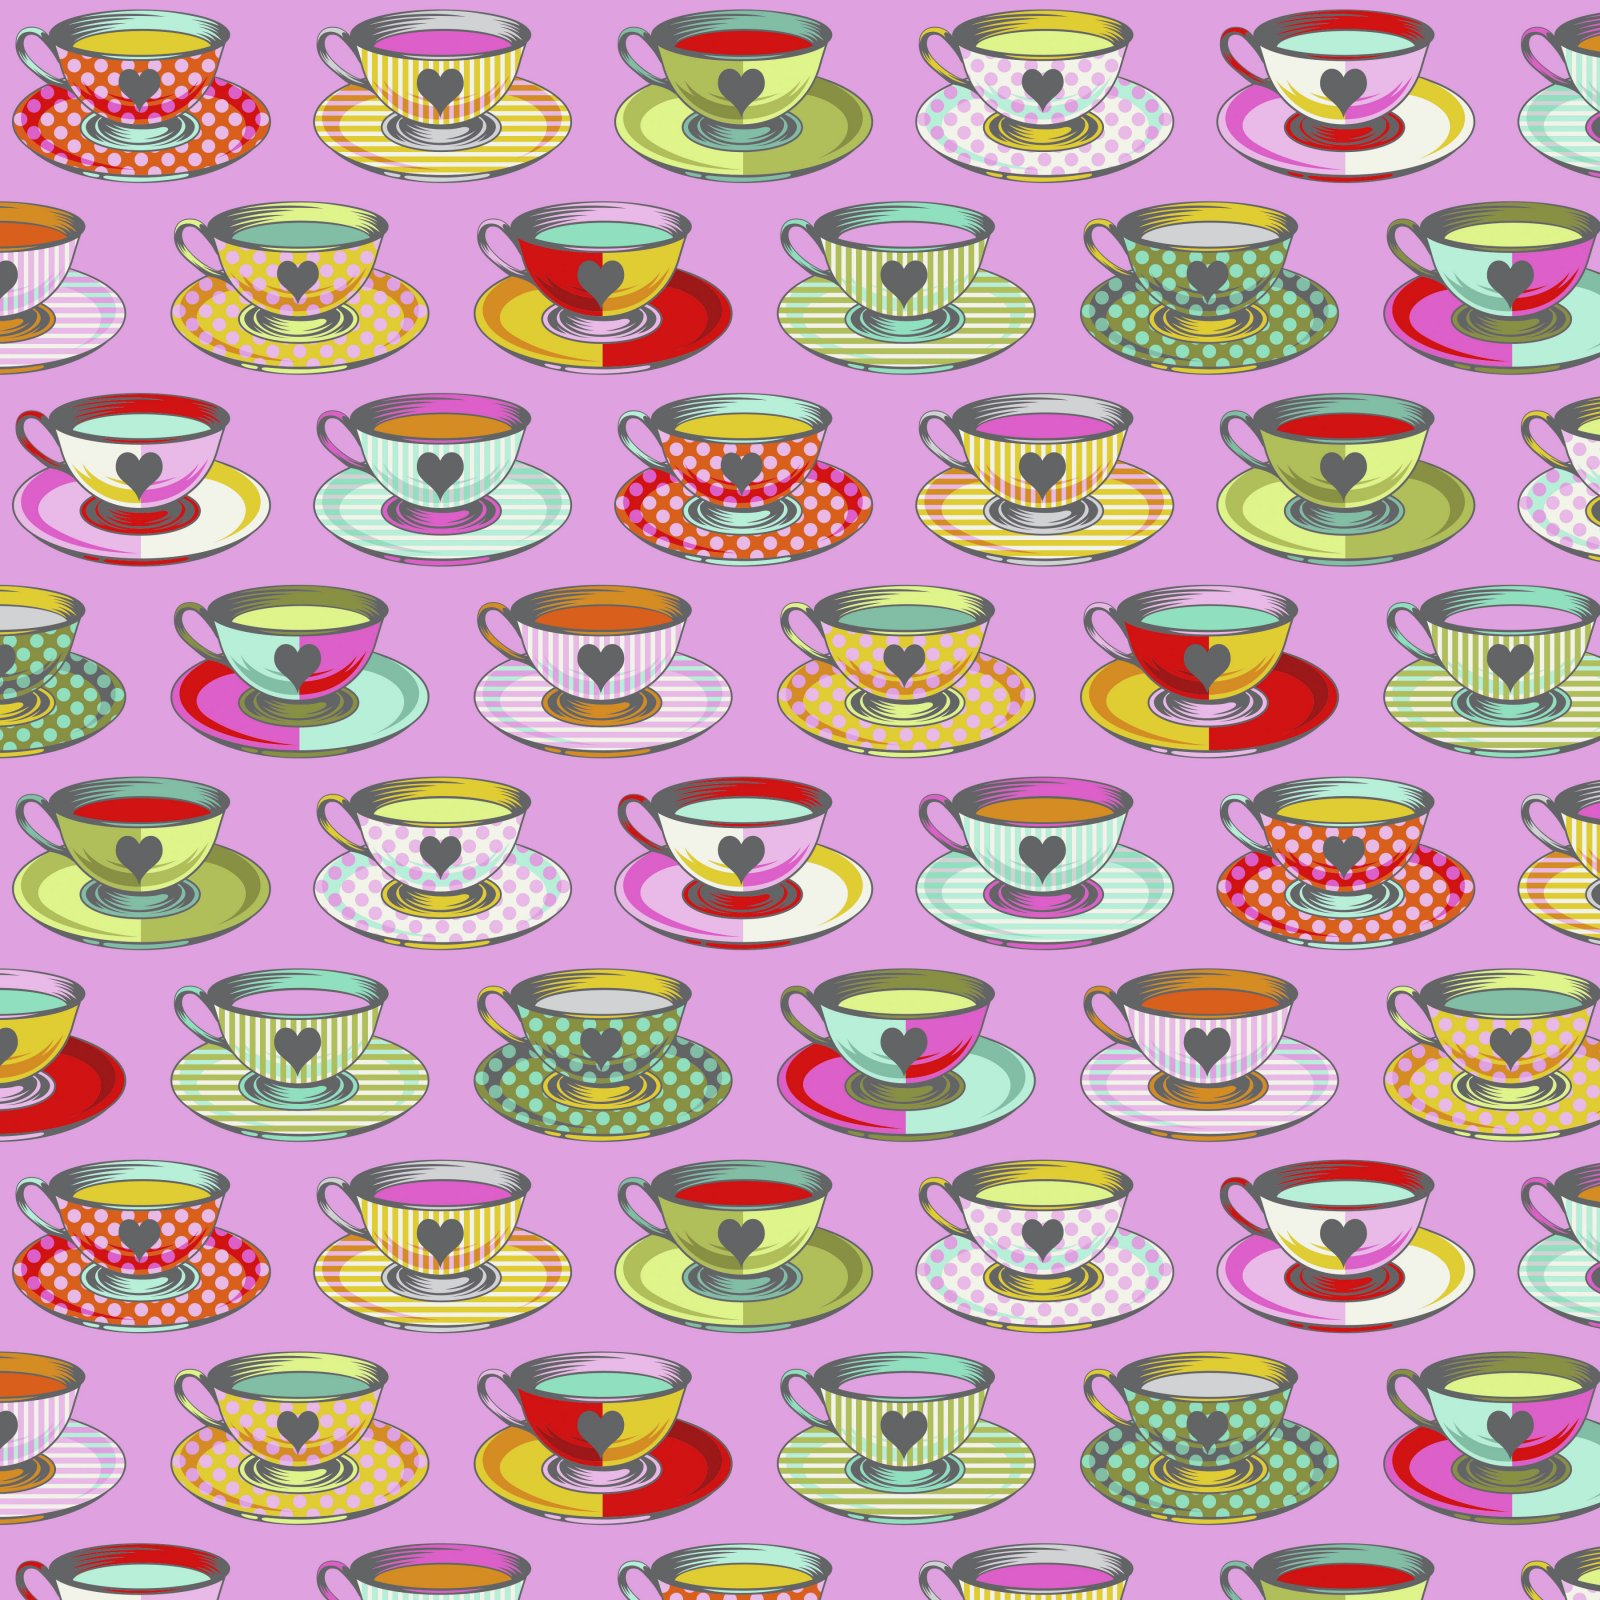 Wonder - Tea Time - Curiouser & Curiouser Collection - Tula Pink - PWTP163.WONDER